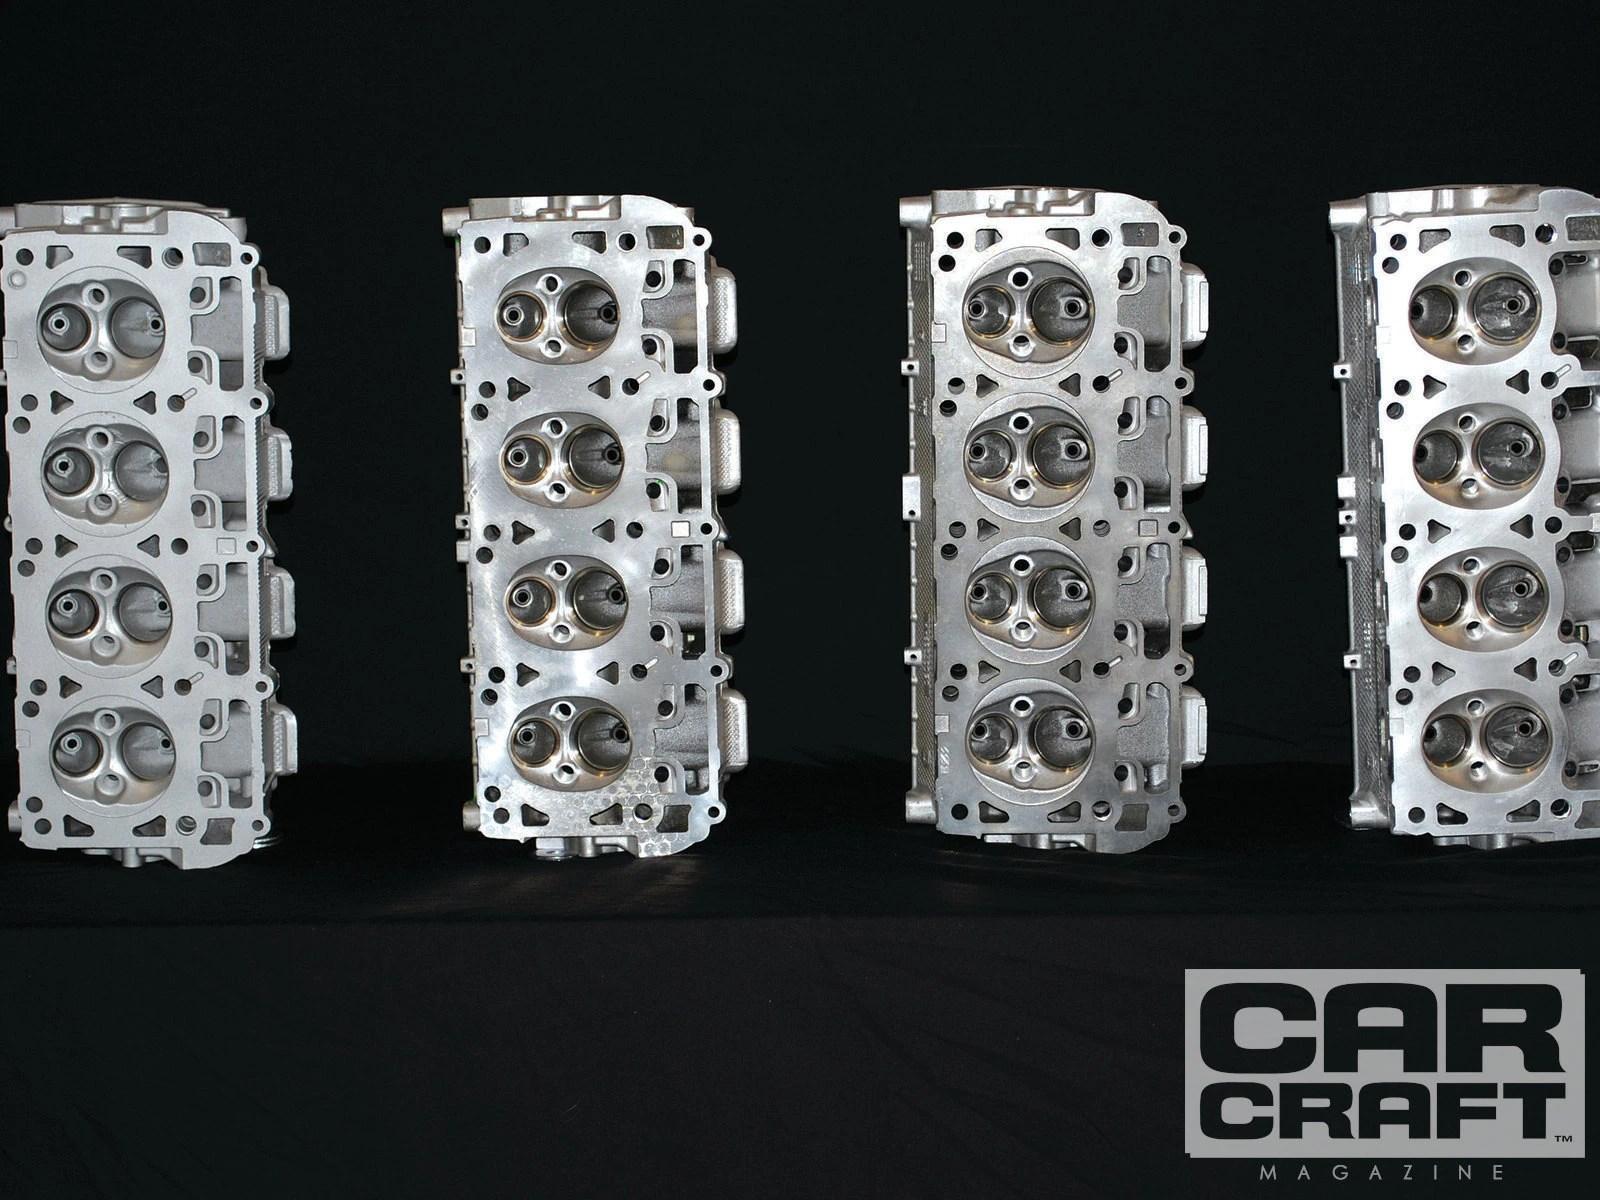 hight resolution of 5 7 hemi 6 1 hemi 6 4 hemi cylinder head comparison